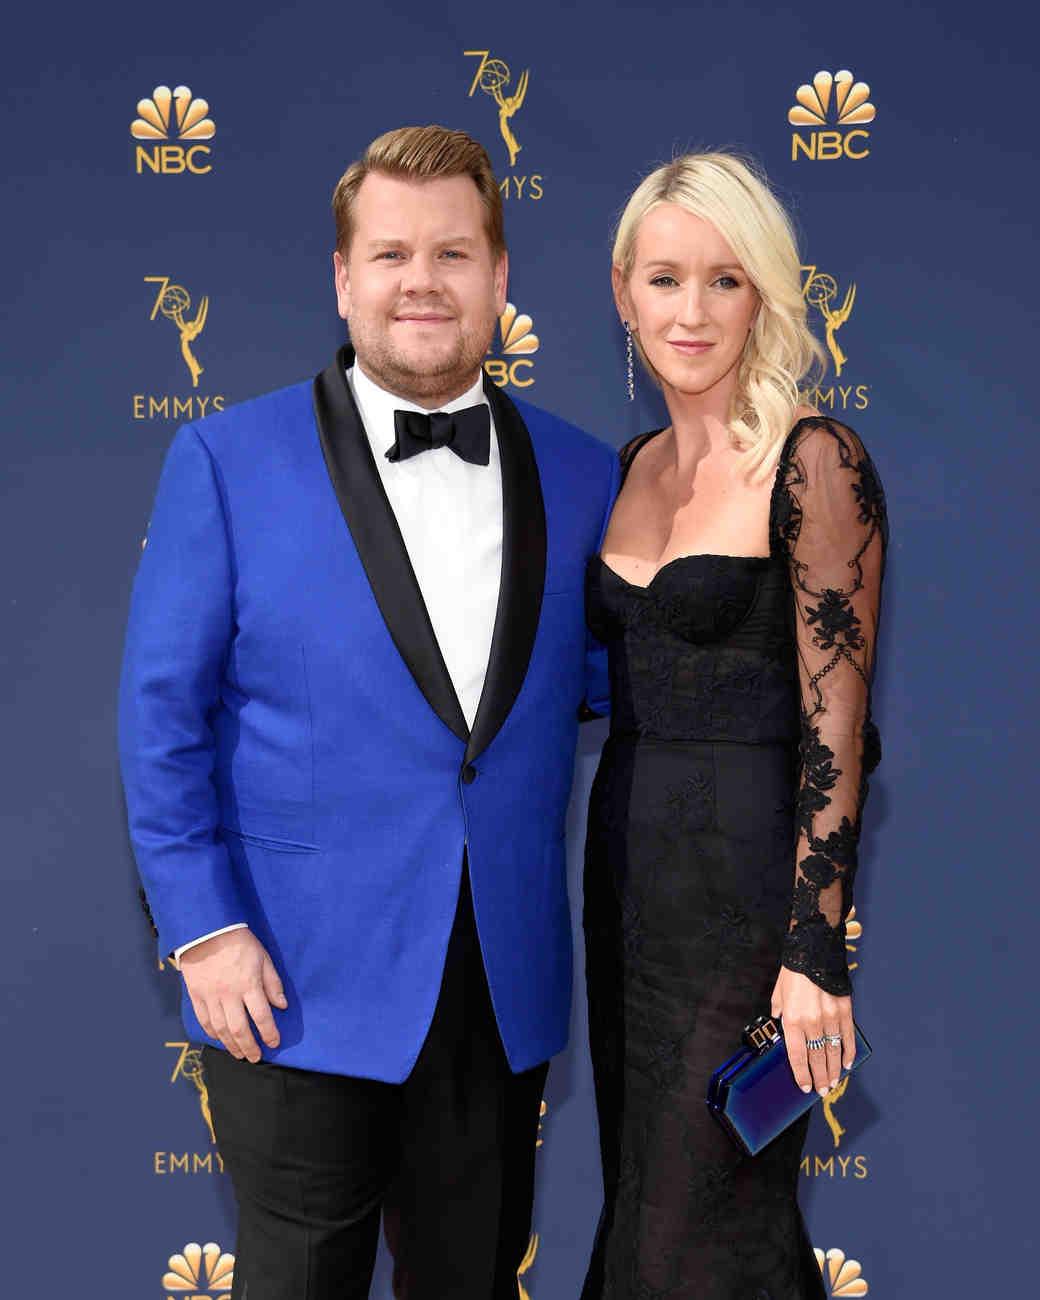 james corden and julia carey emmys 2018